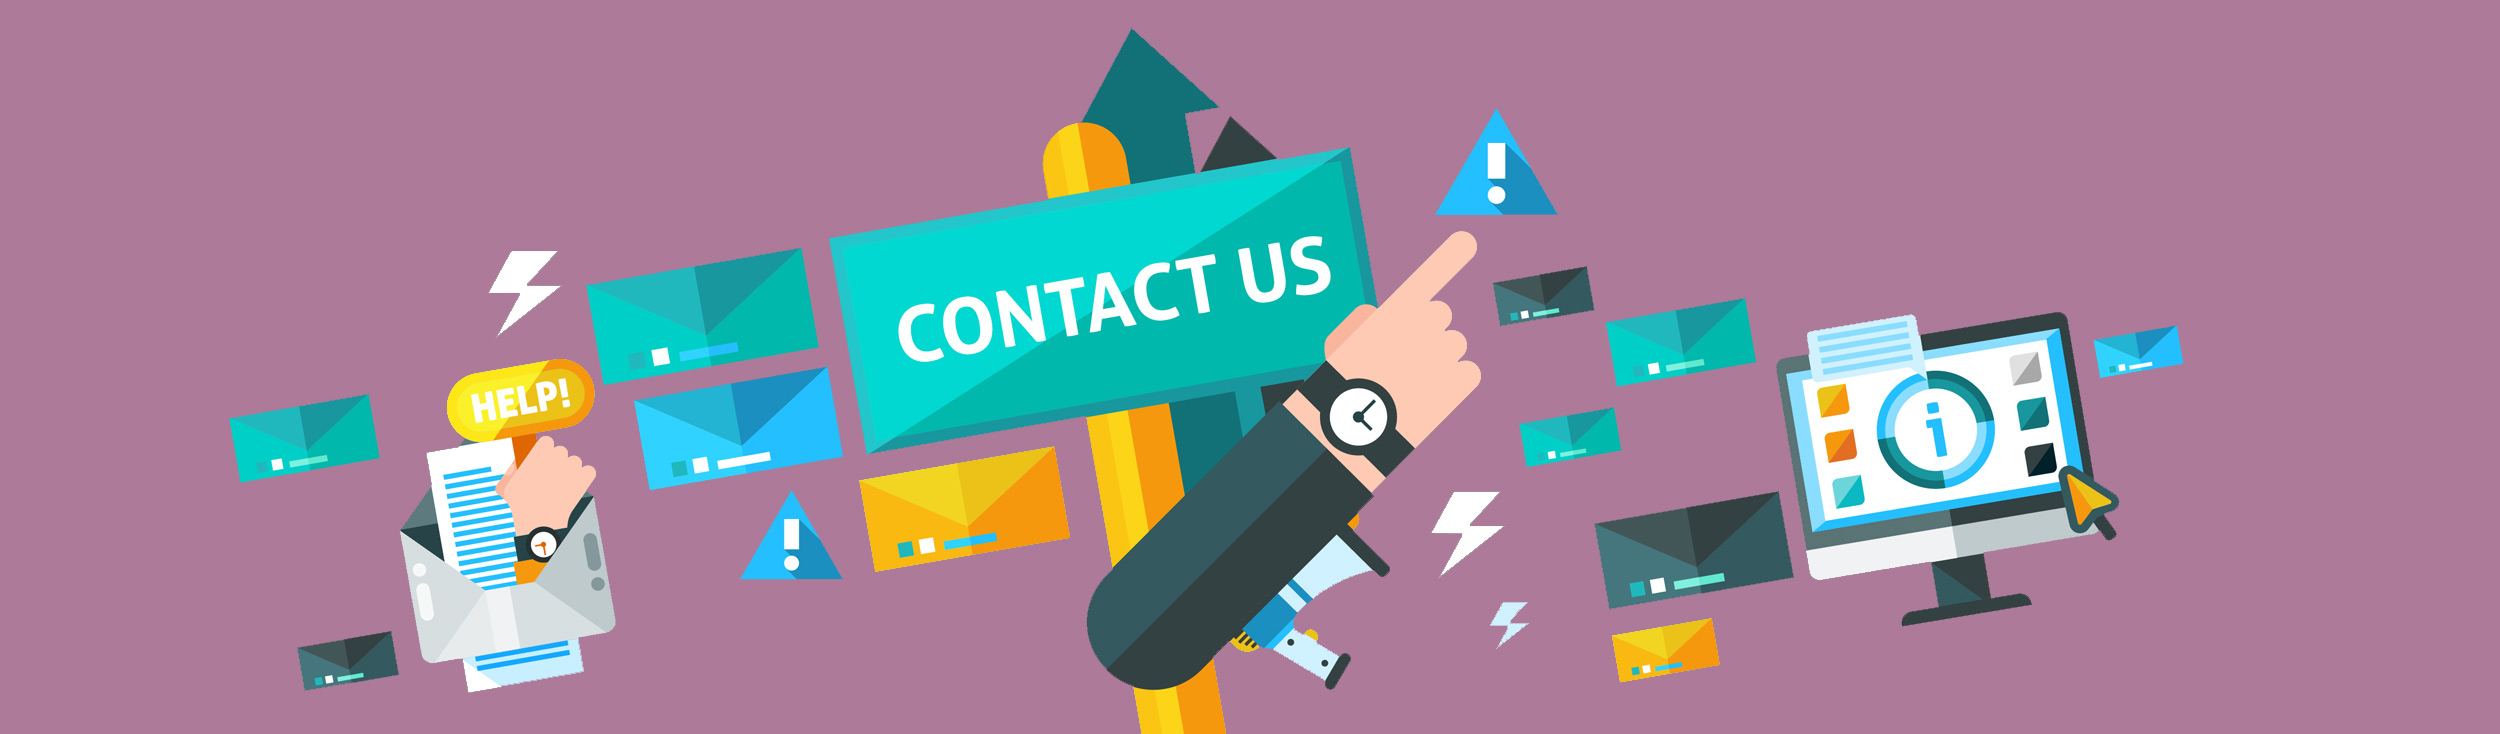 contact us header corepcsystems